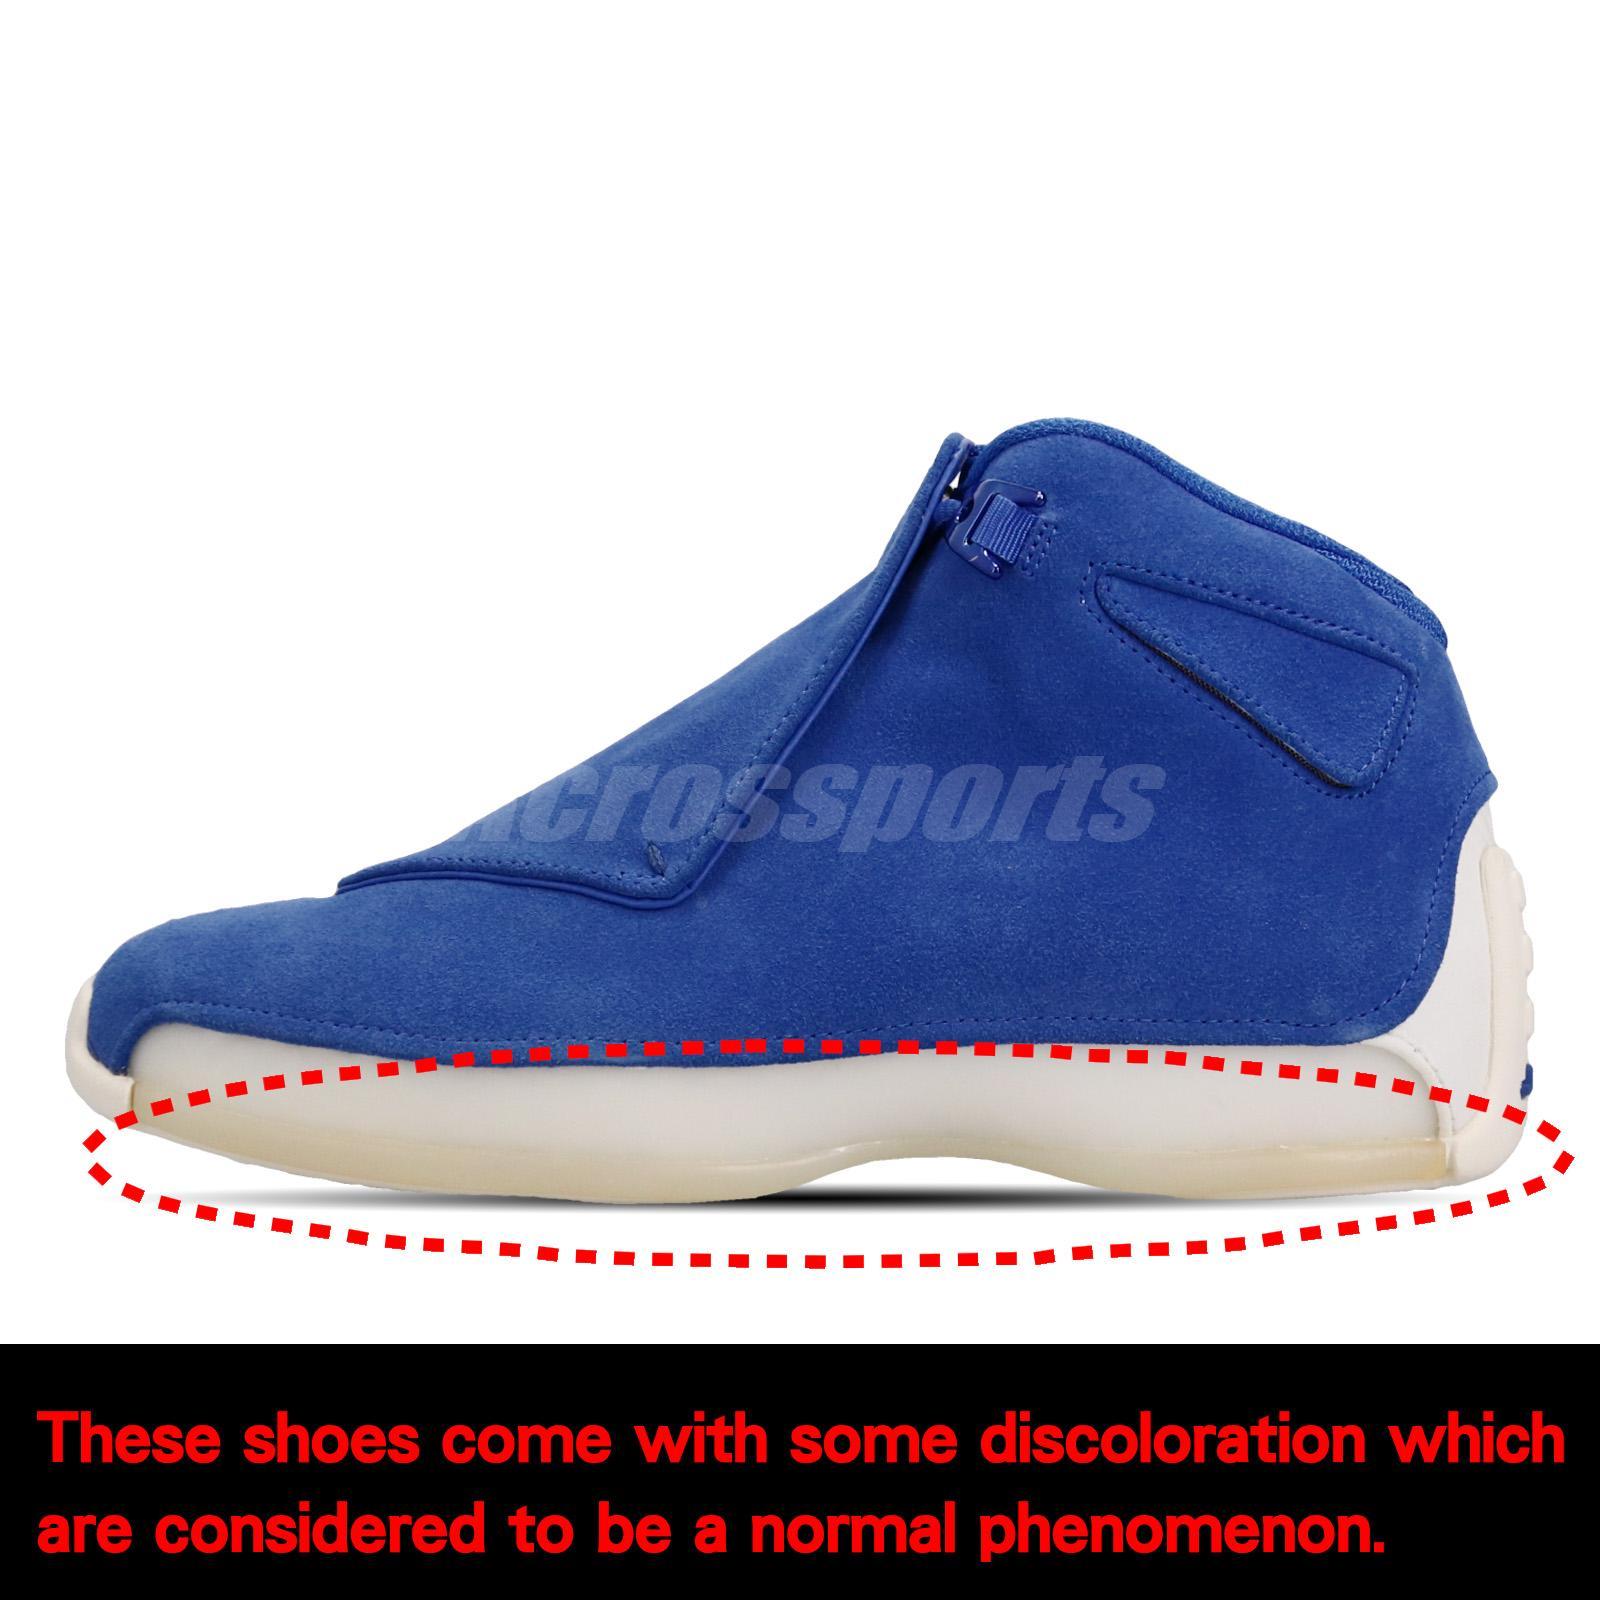 4f733db12ac324 Nike Air Jordan 18 Retro Racer Blue Suede Mens Basketball Shoes AA2494-401